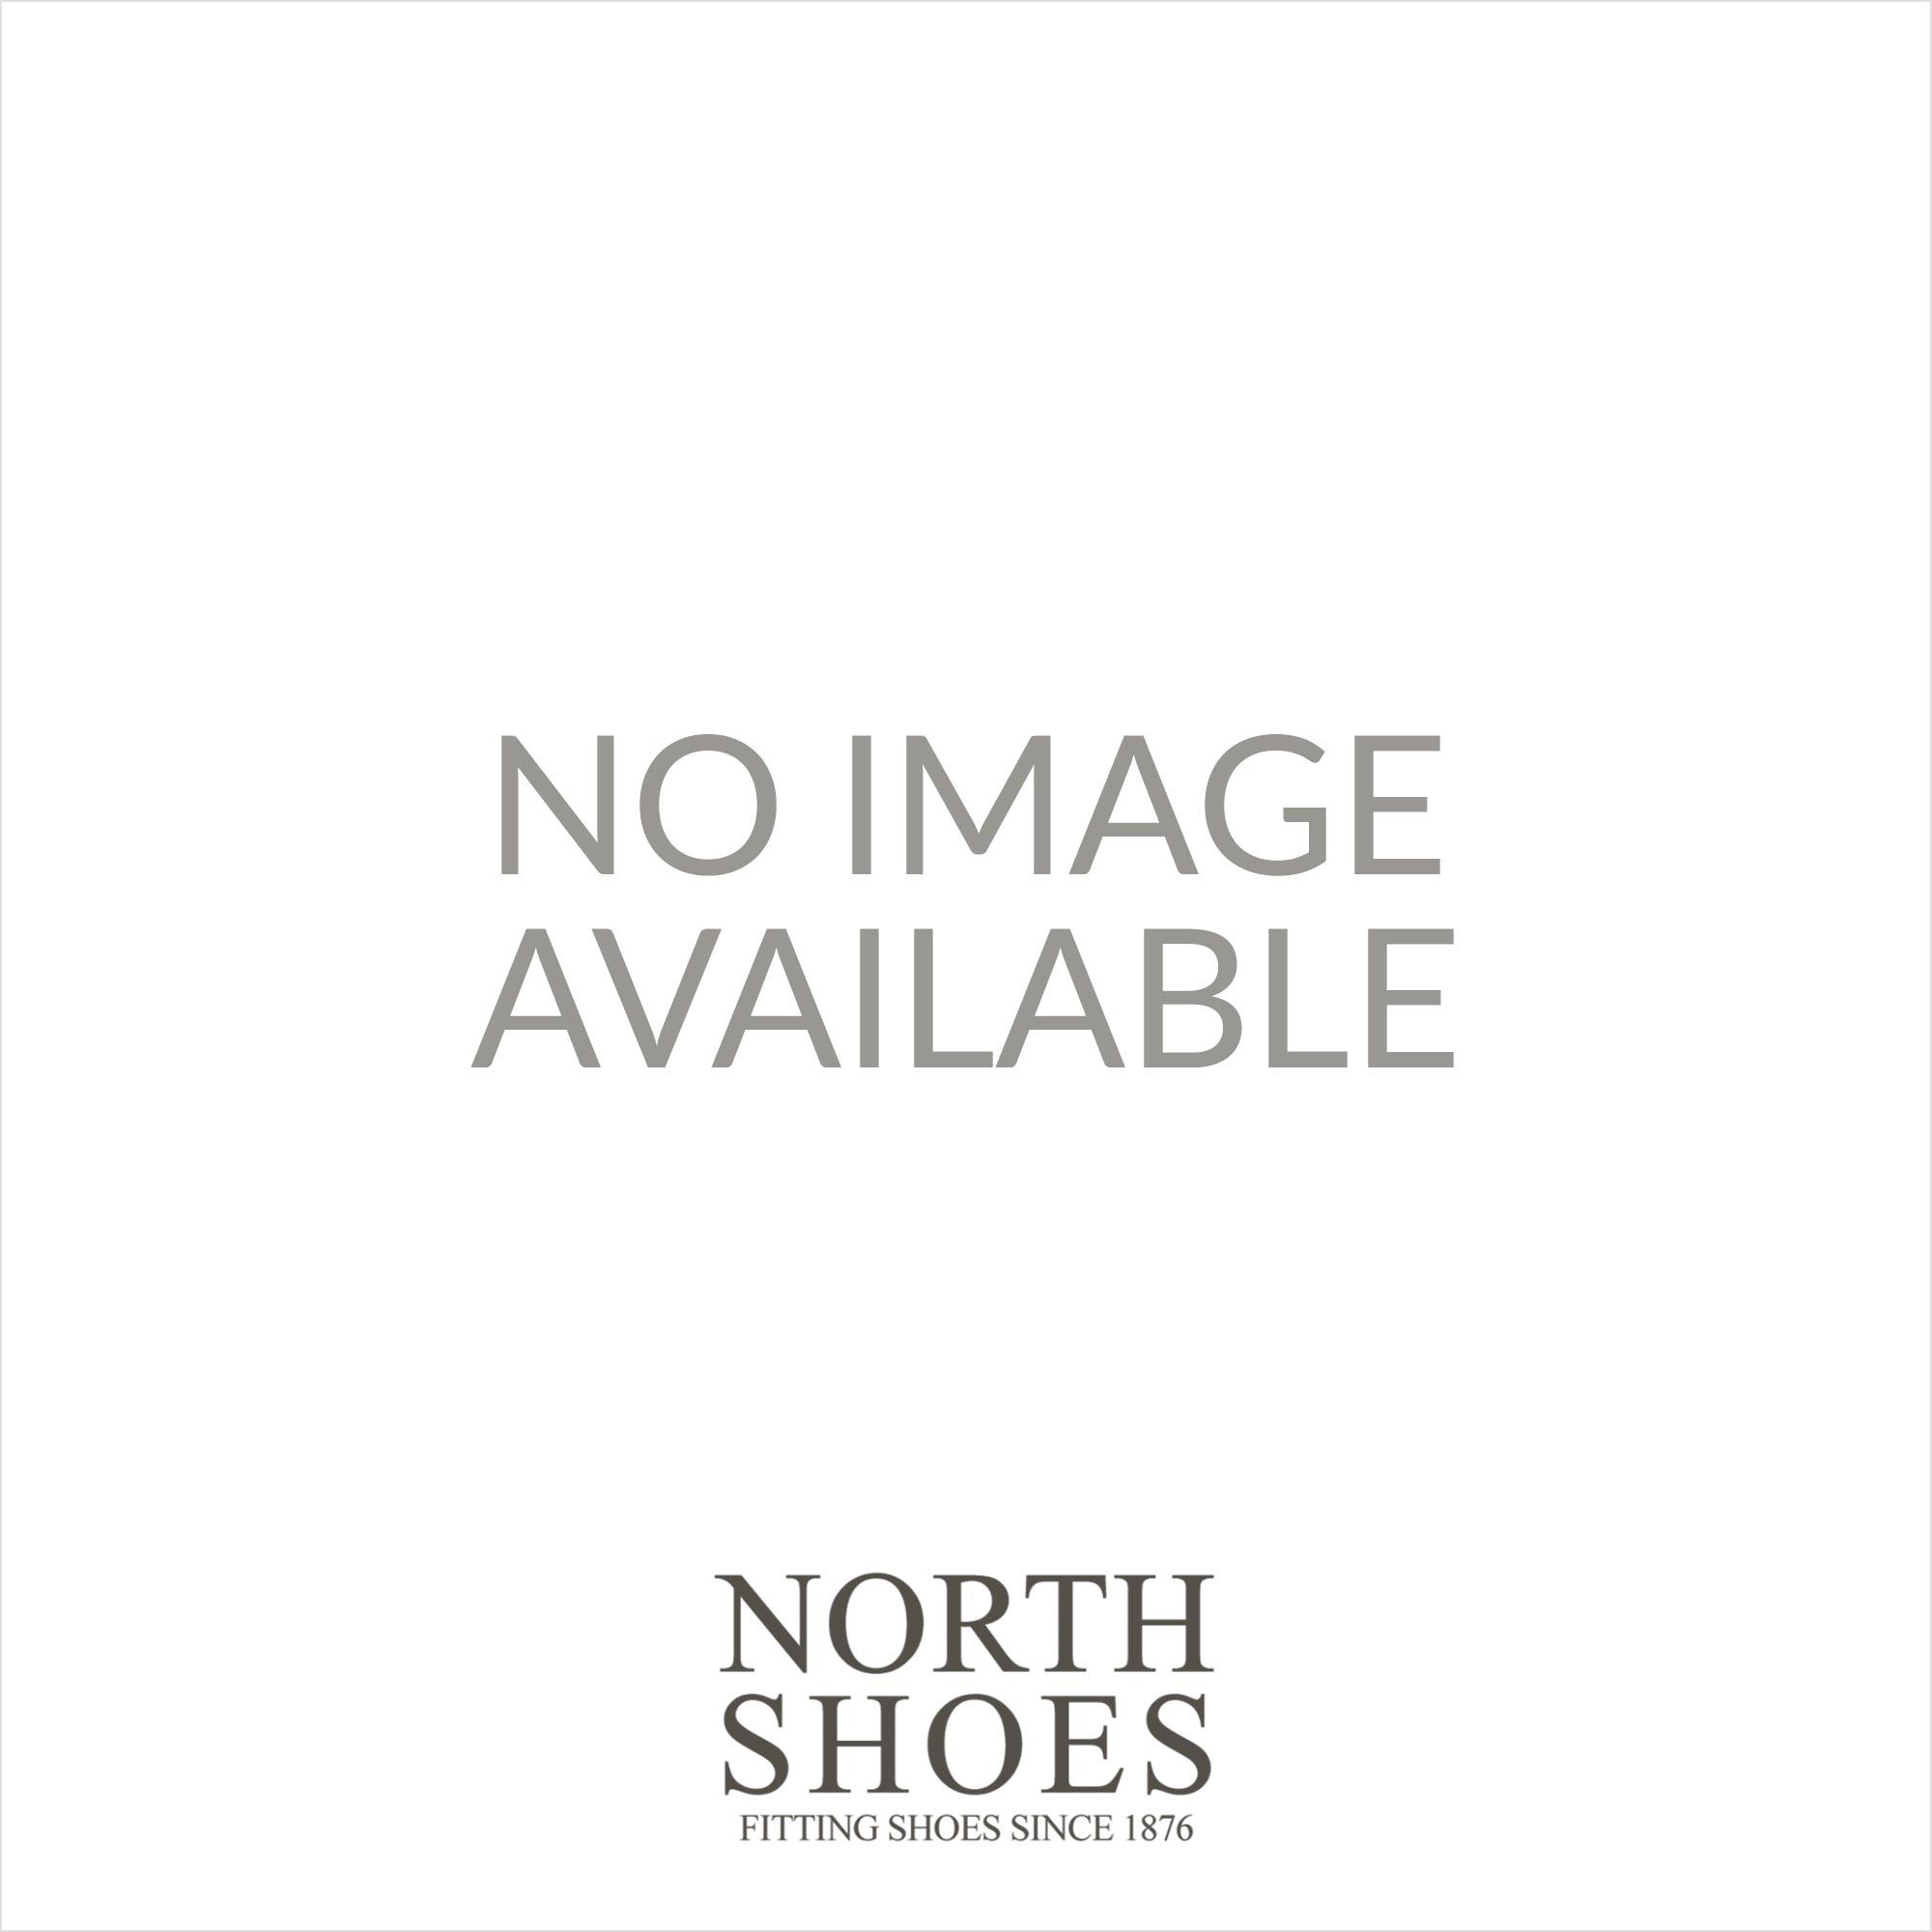 a1c2d0ef484 Skechers 14680 Purple Rubber Womens Toe Post Flip Flop Sandal - Skechers  from North Shoes UK